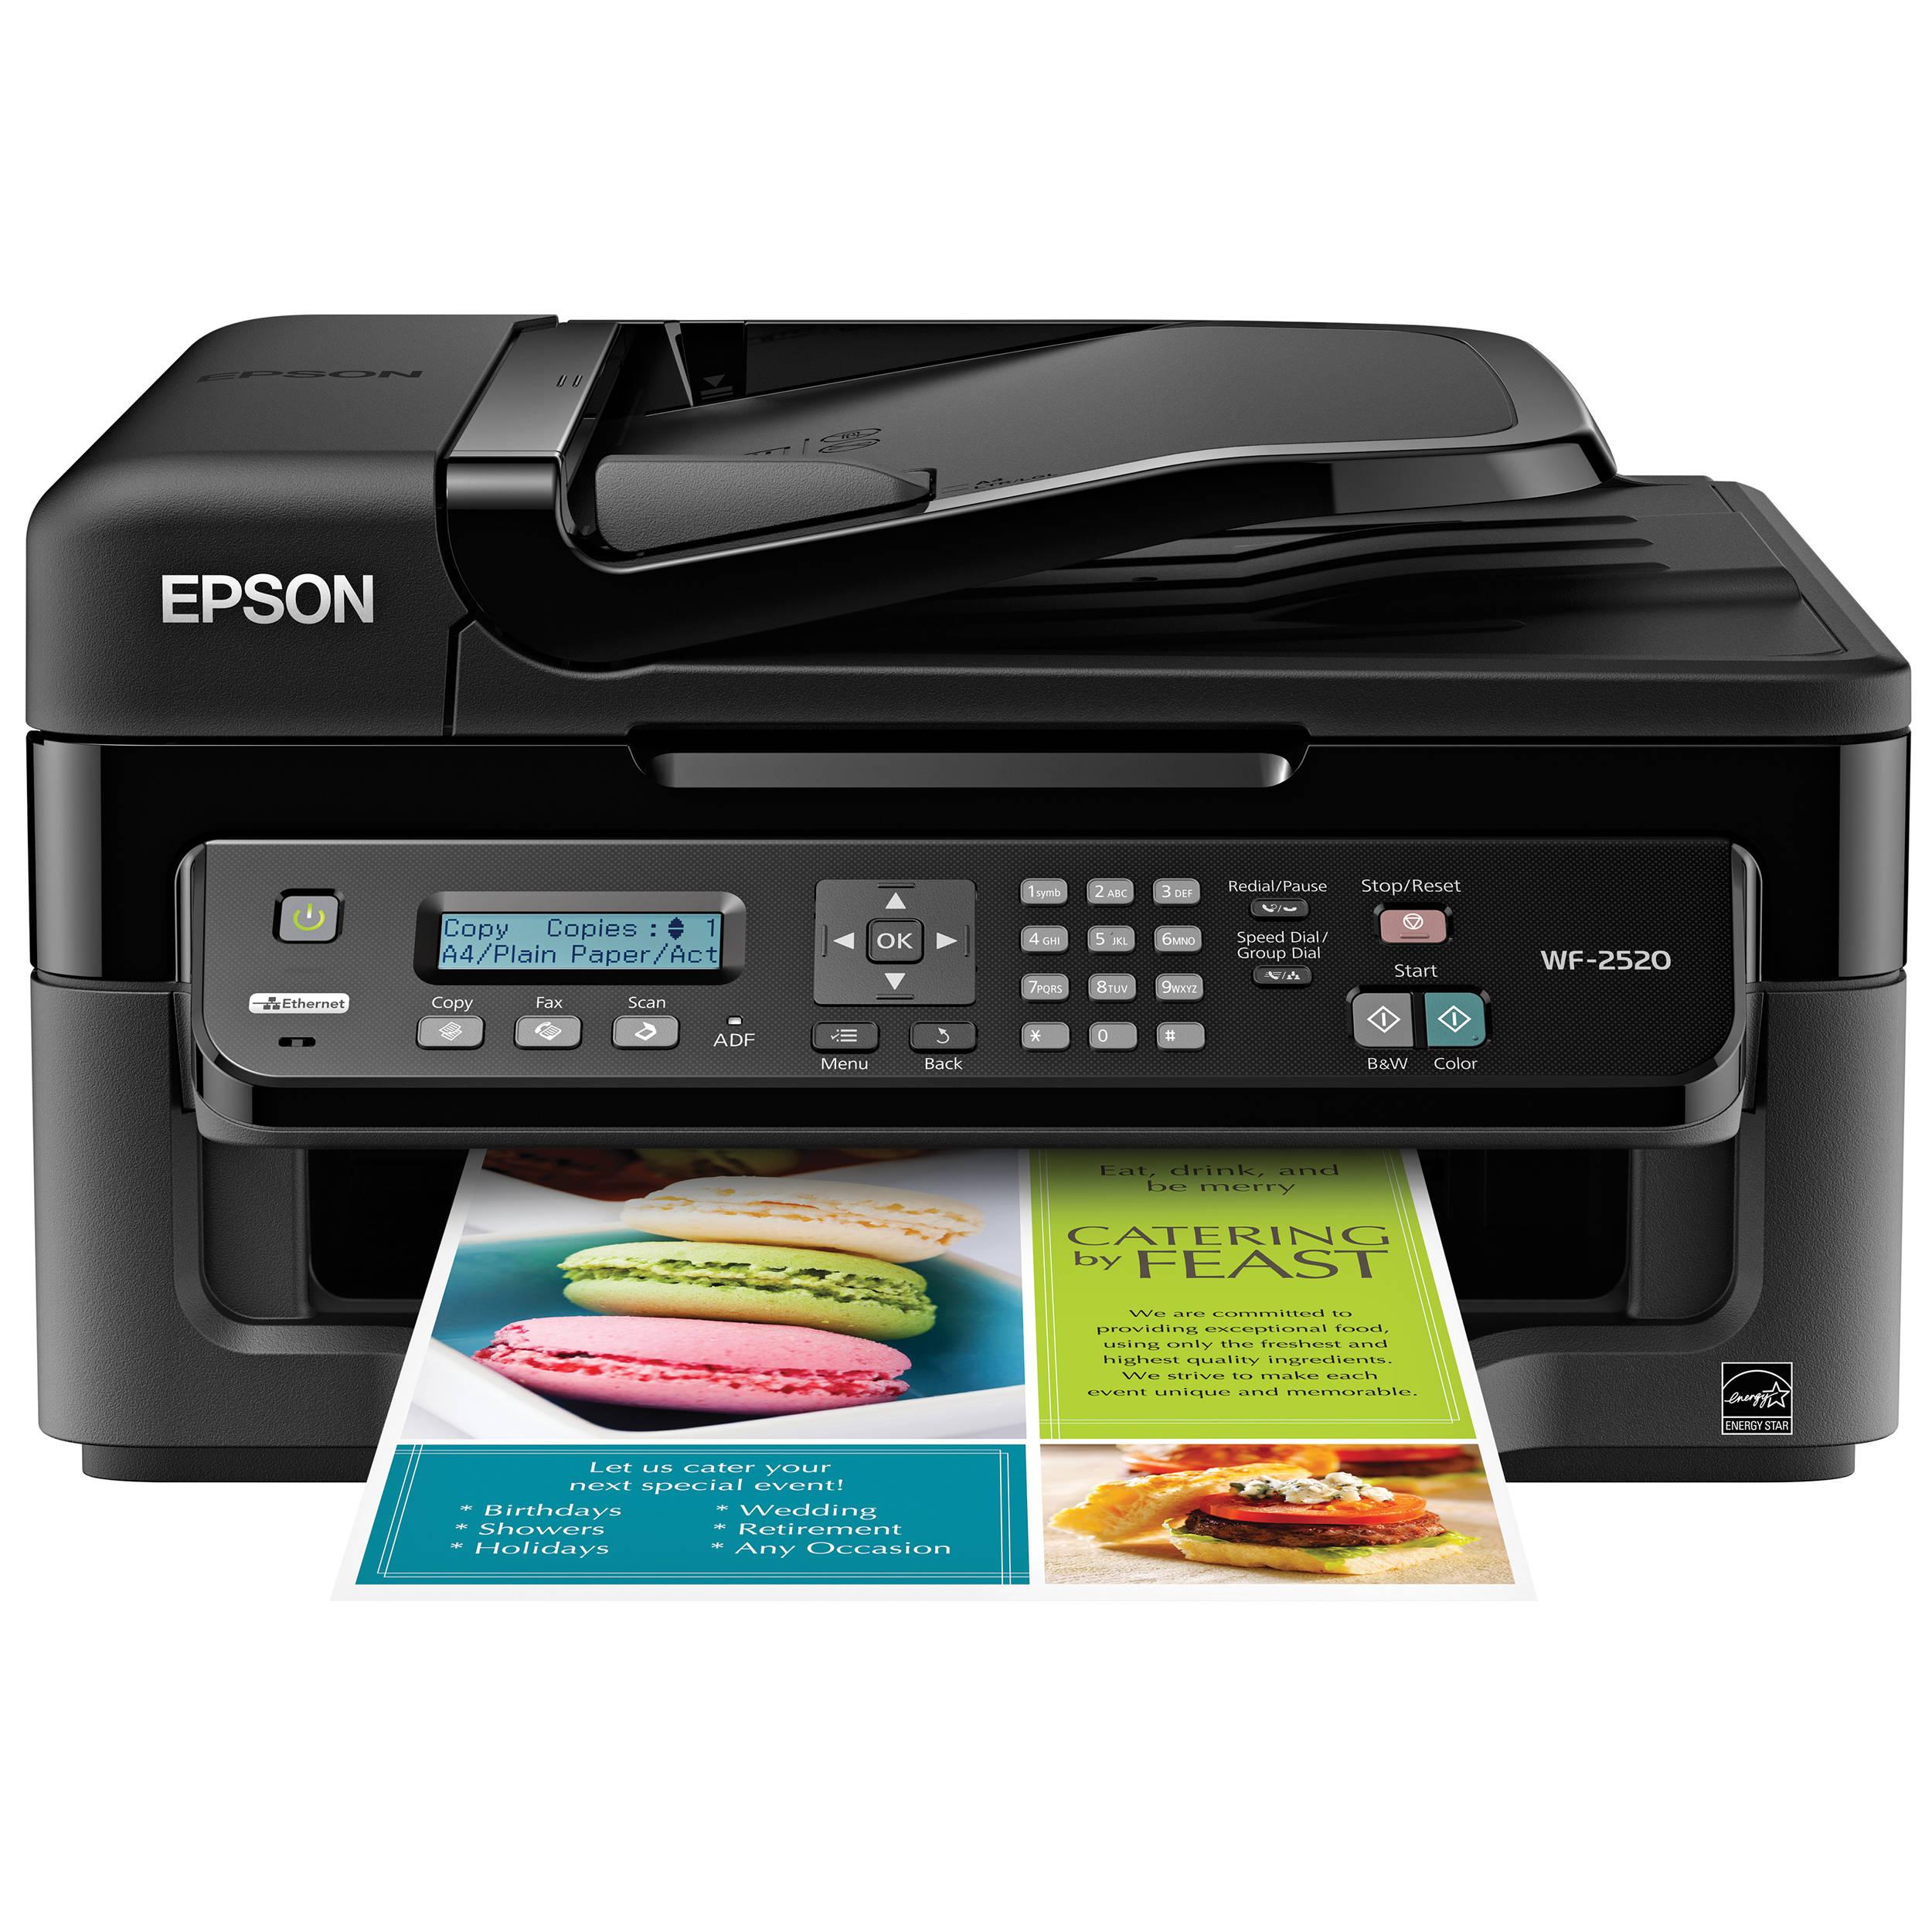 Epson WorkForce WF2520 Inkjet Printer